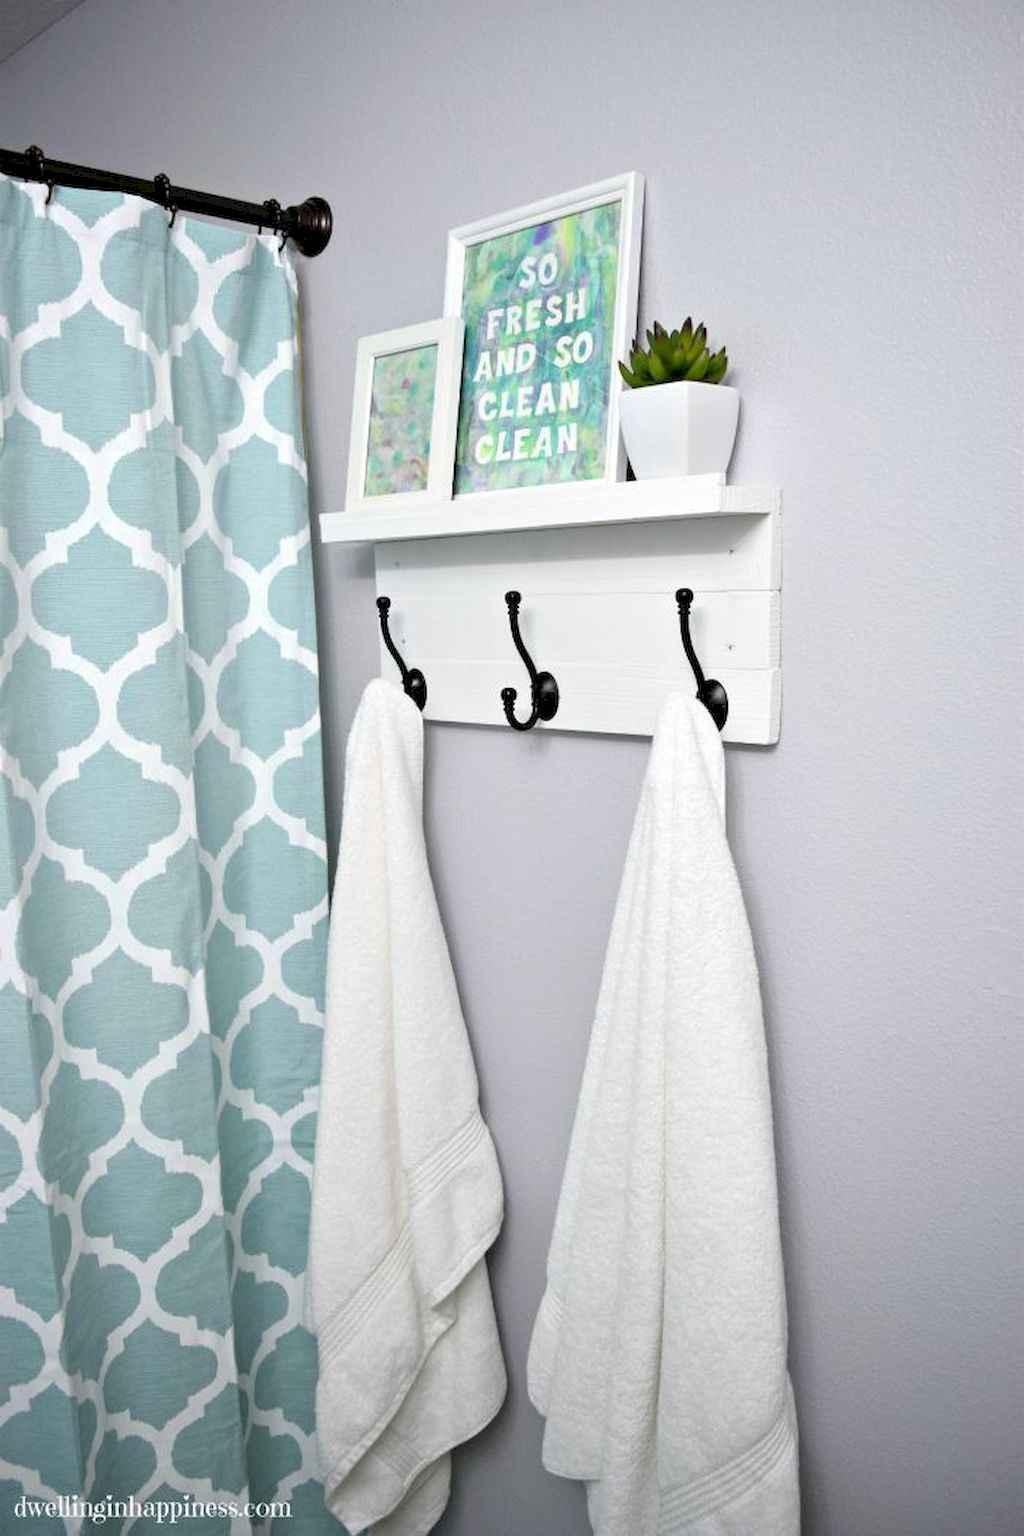 111 Brilliant Small Bathroom Remodel Ideas On A Budget (2)